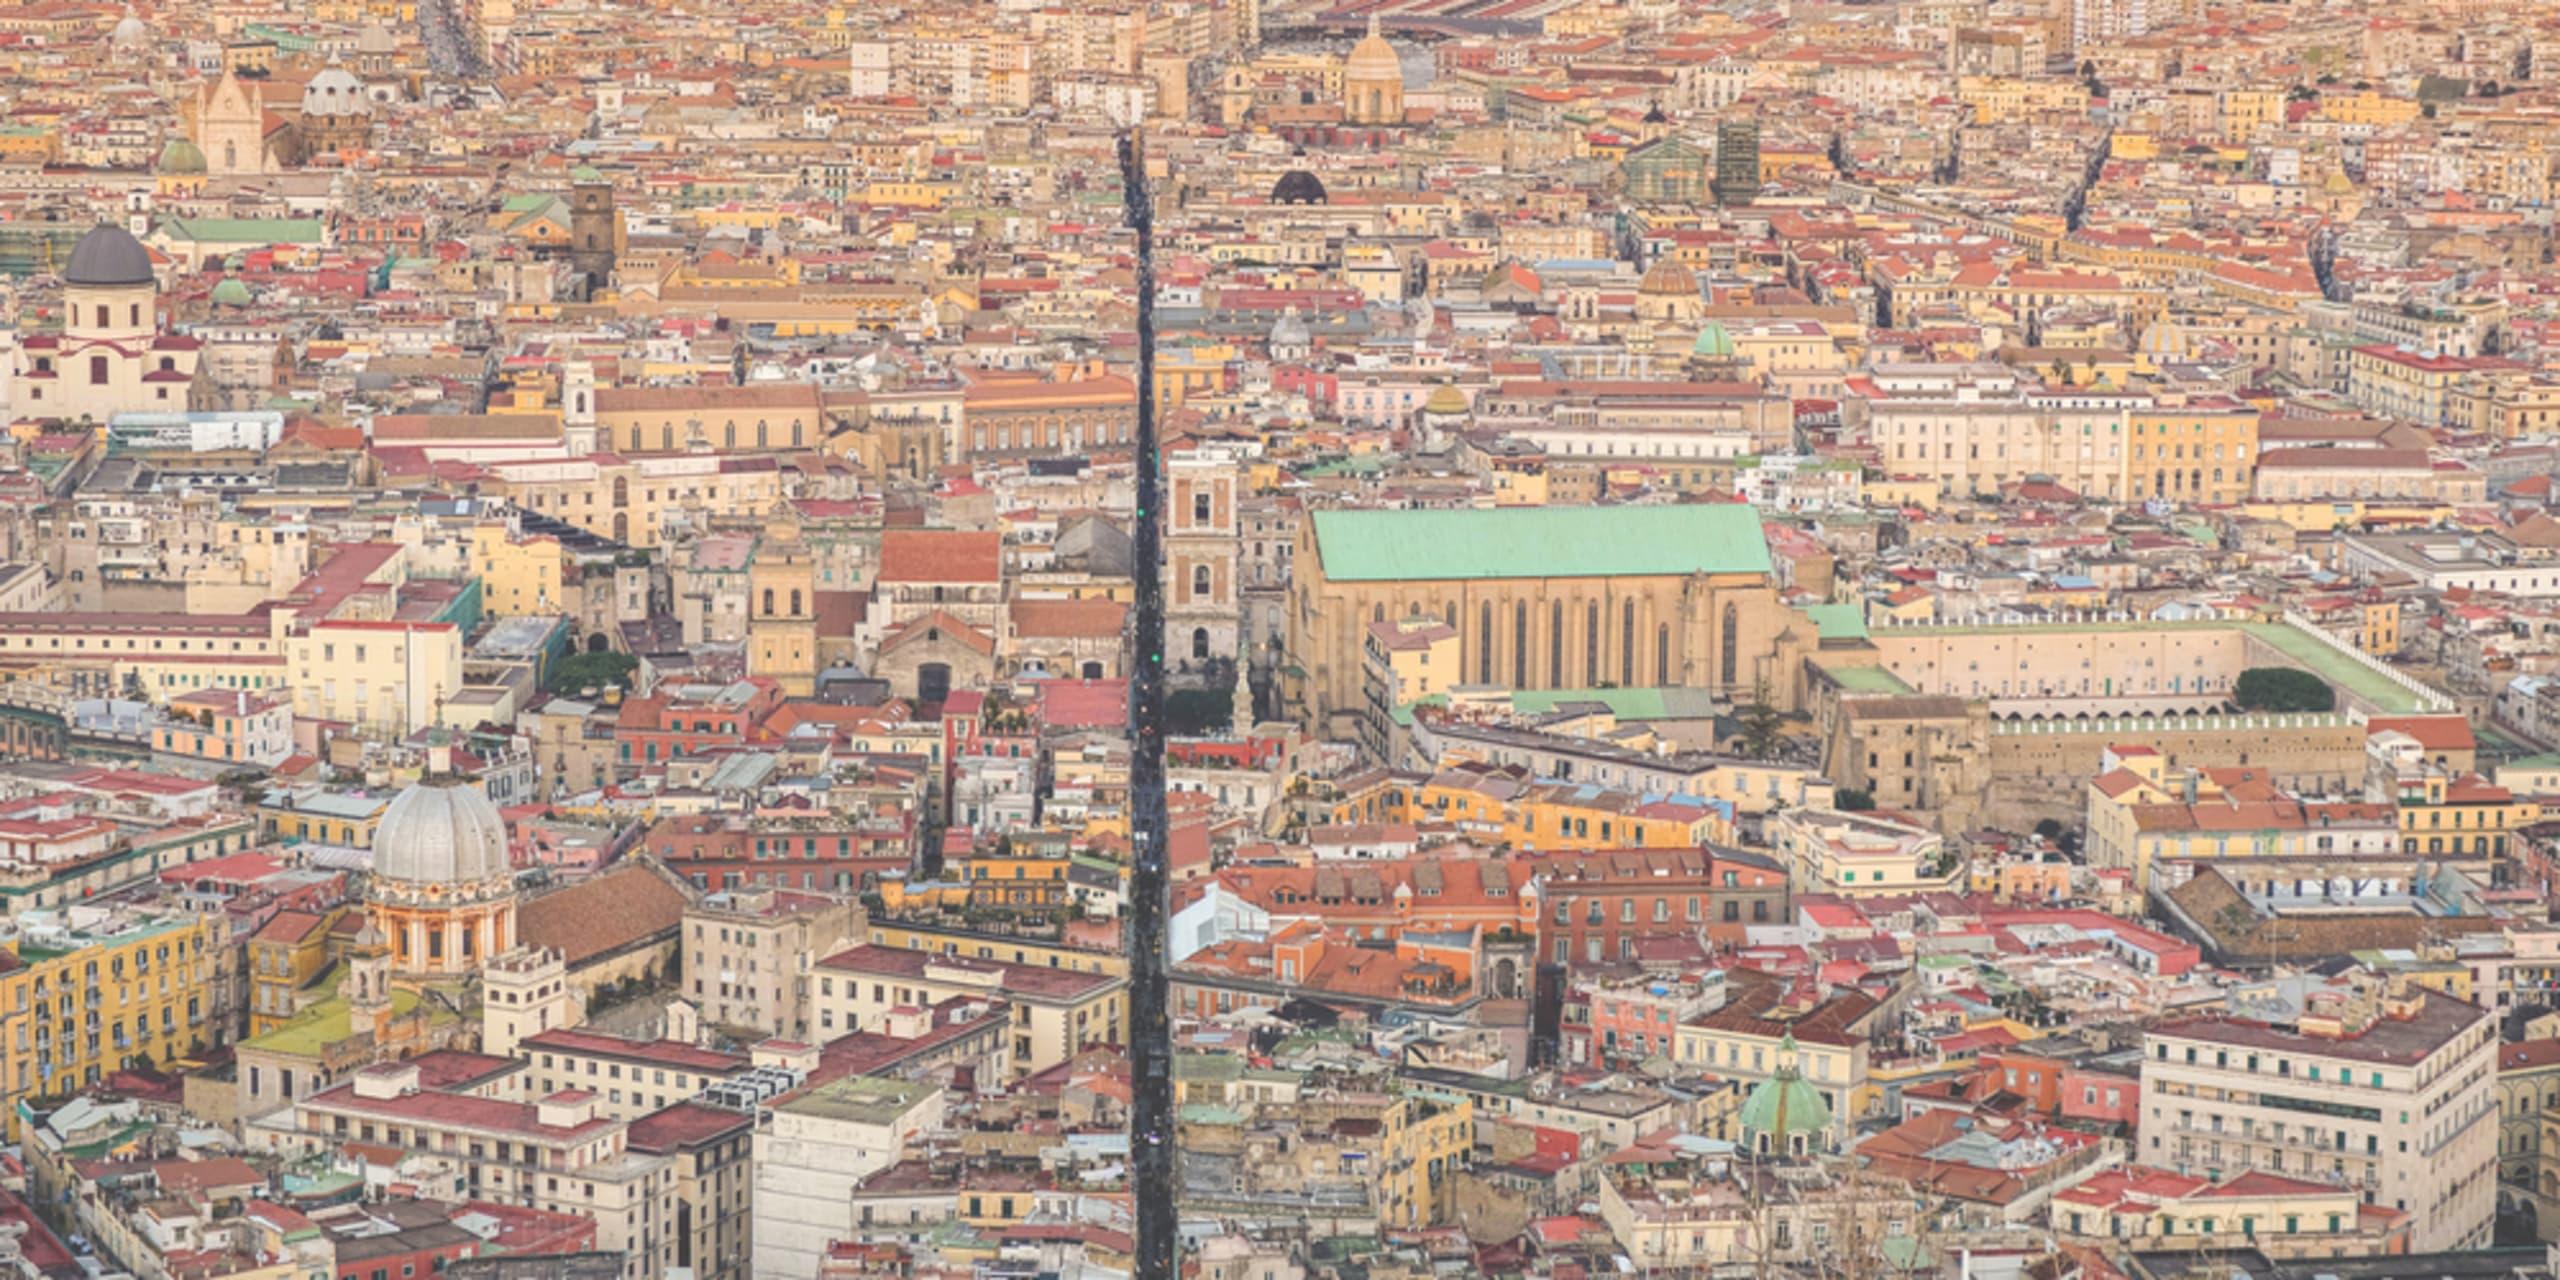 Naples - Naples Hidden Gems: Strolling Through a UNESCO World Heritage Site